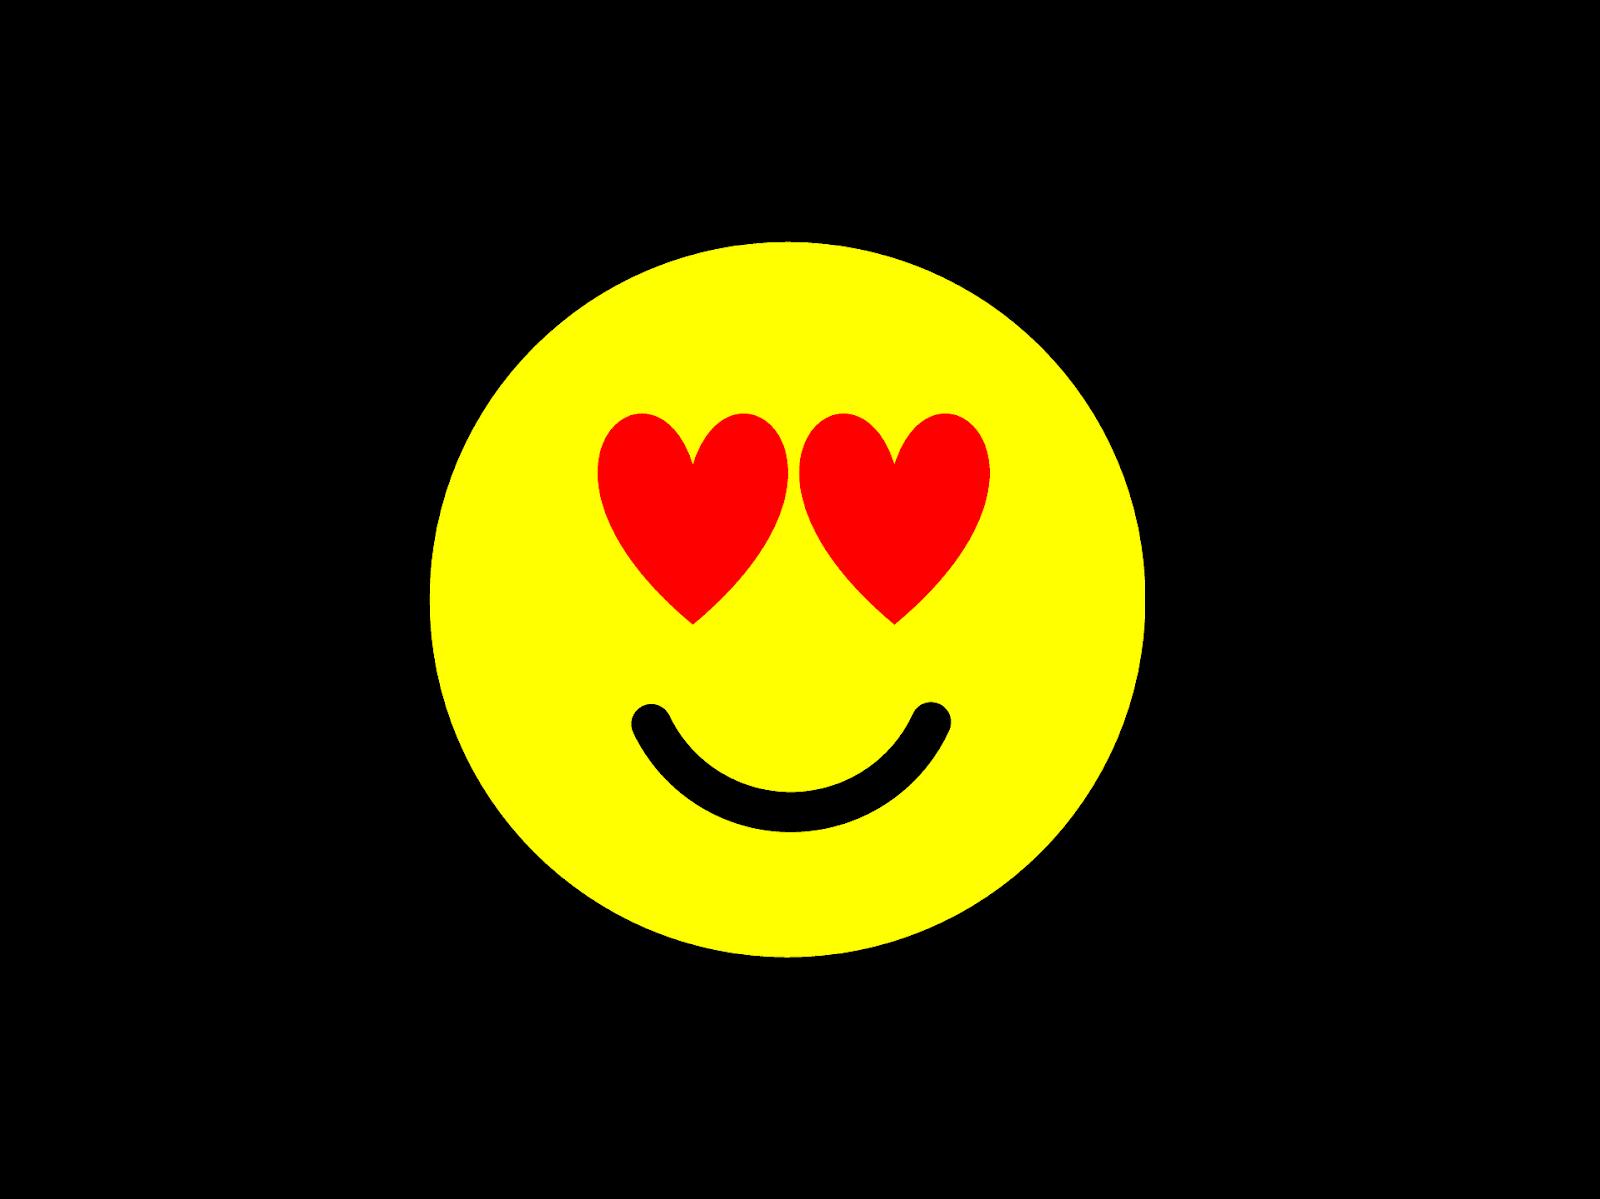 30 Emoji Image For Whatsapp Dp True Hindi Help